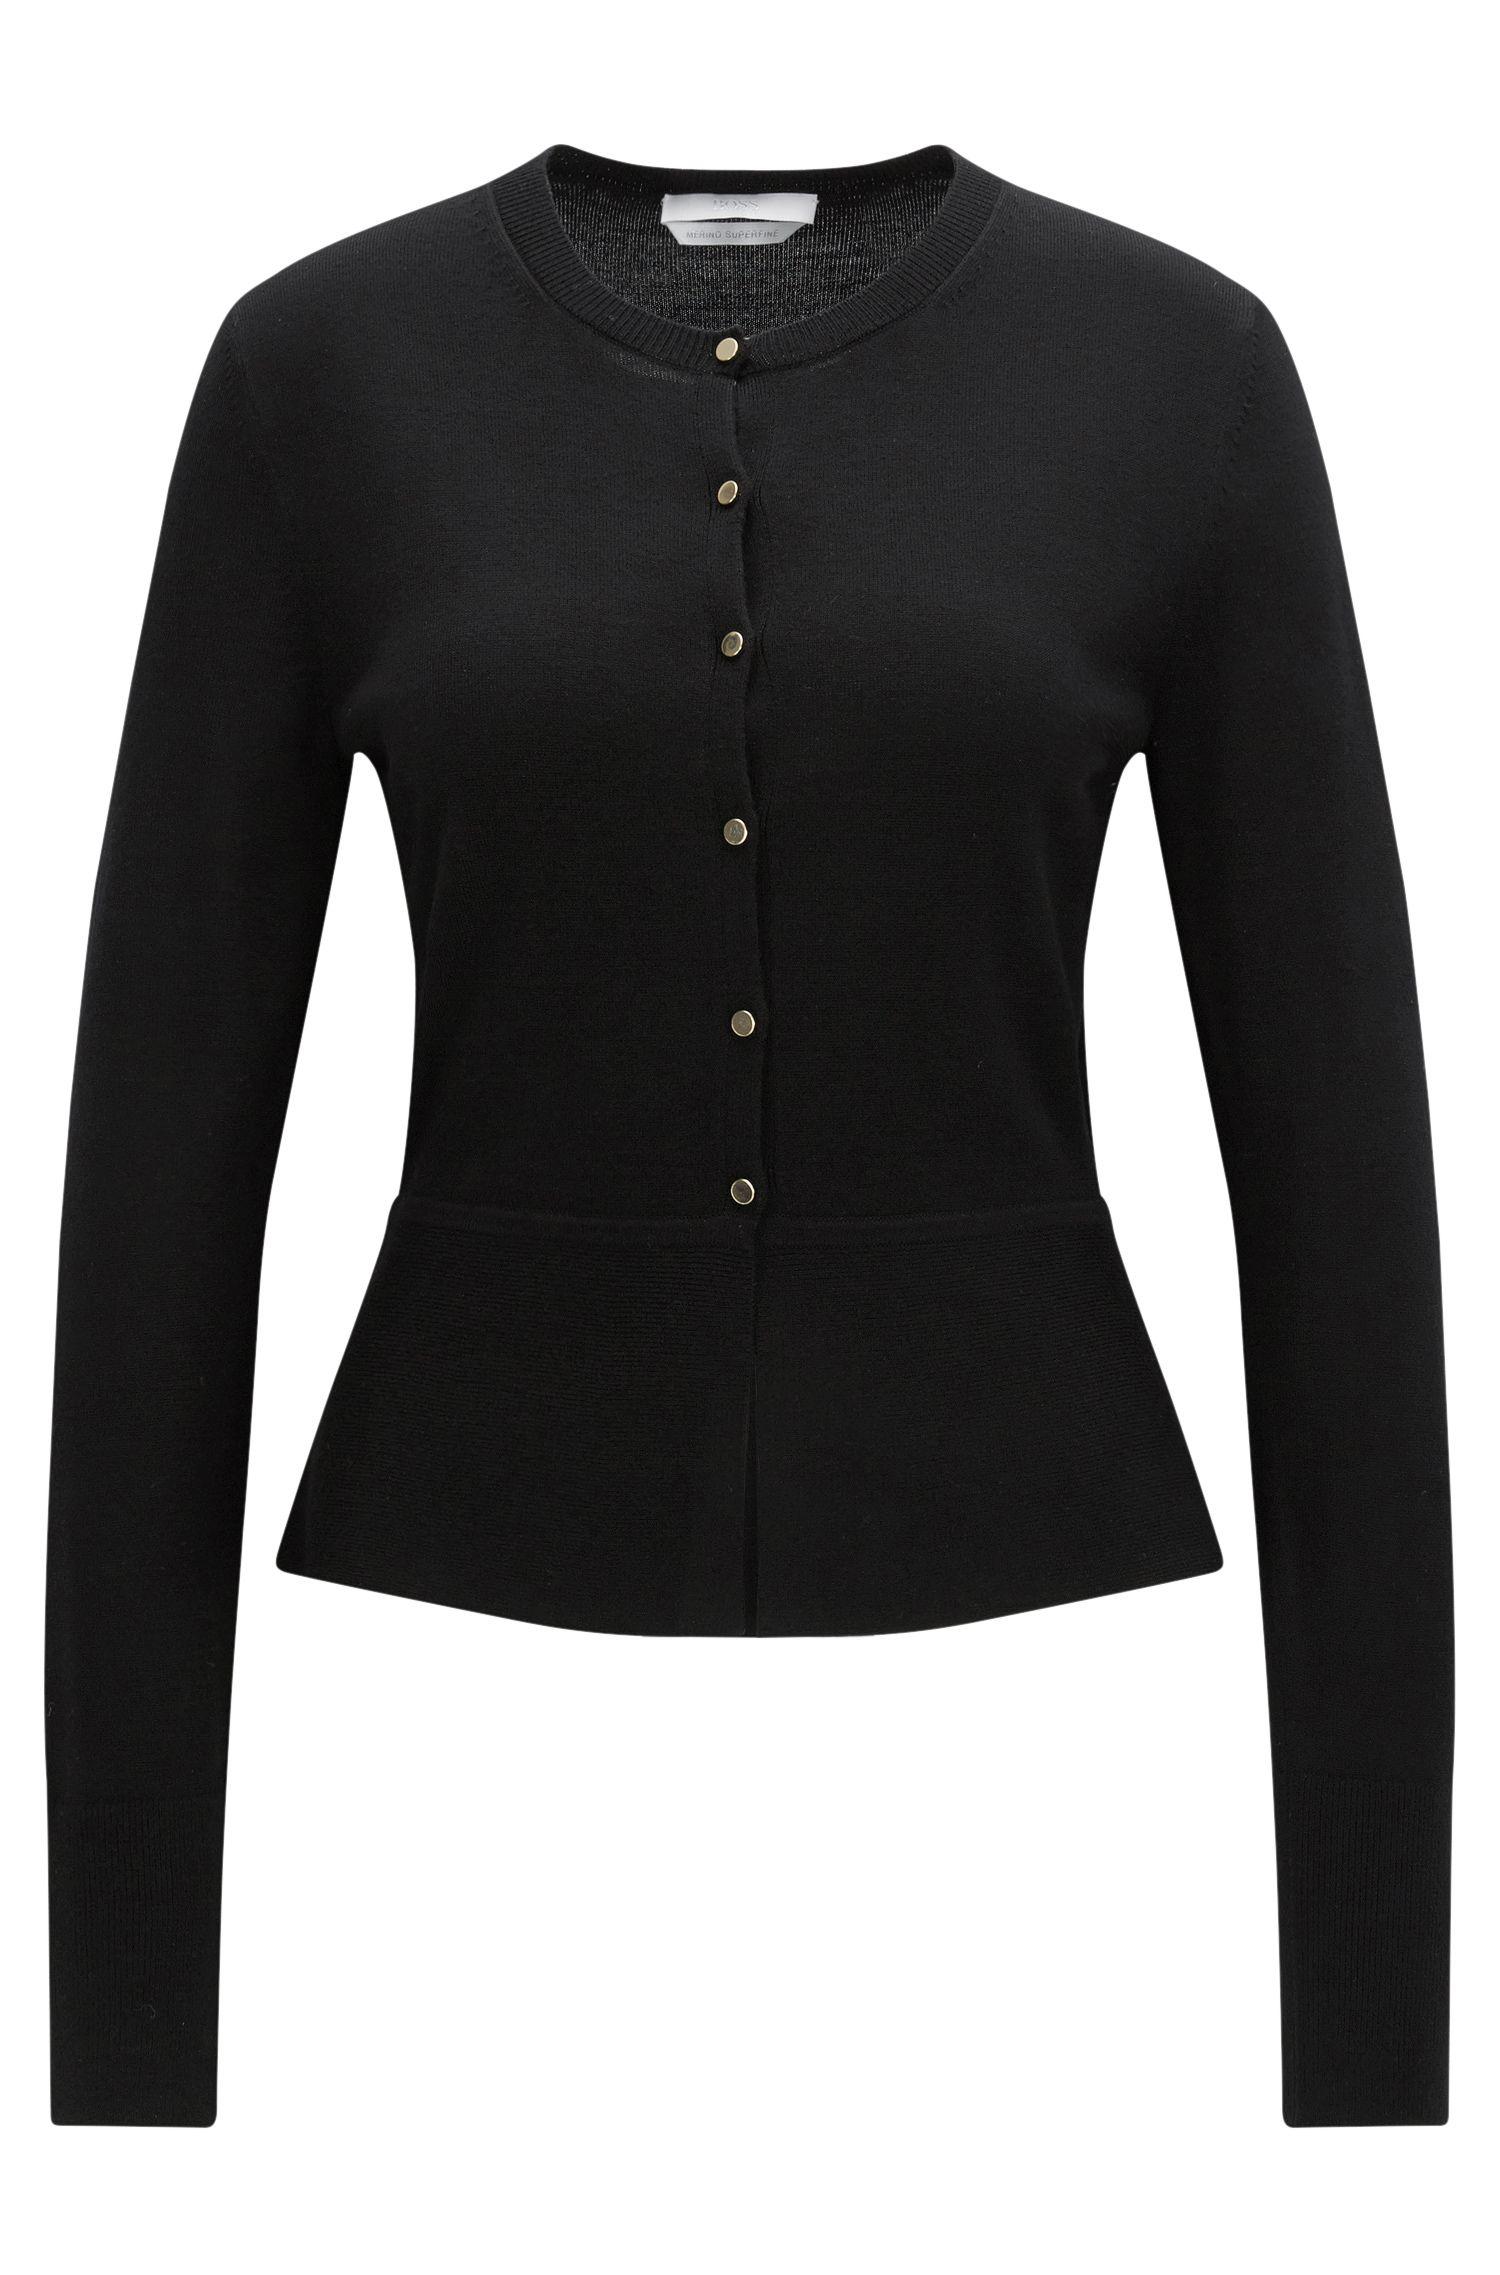 Button-through cardigan in mercerised virgin wool